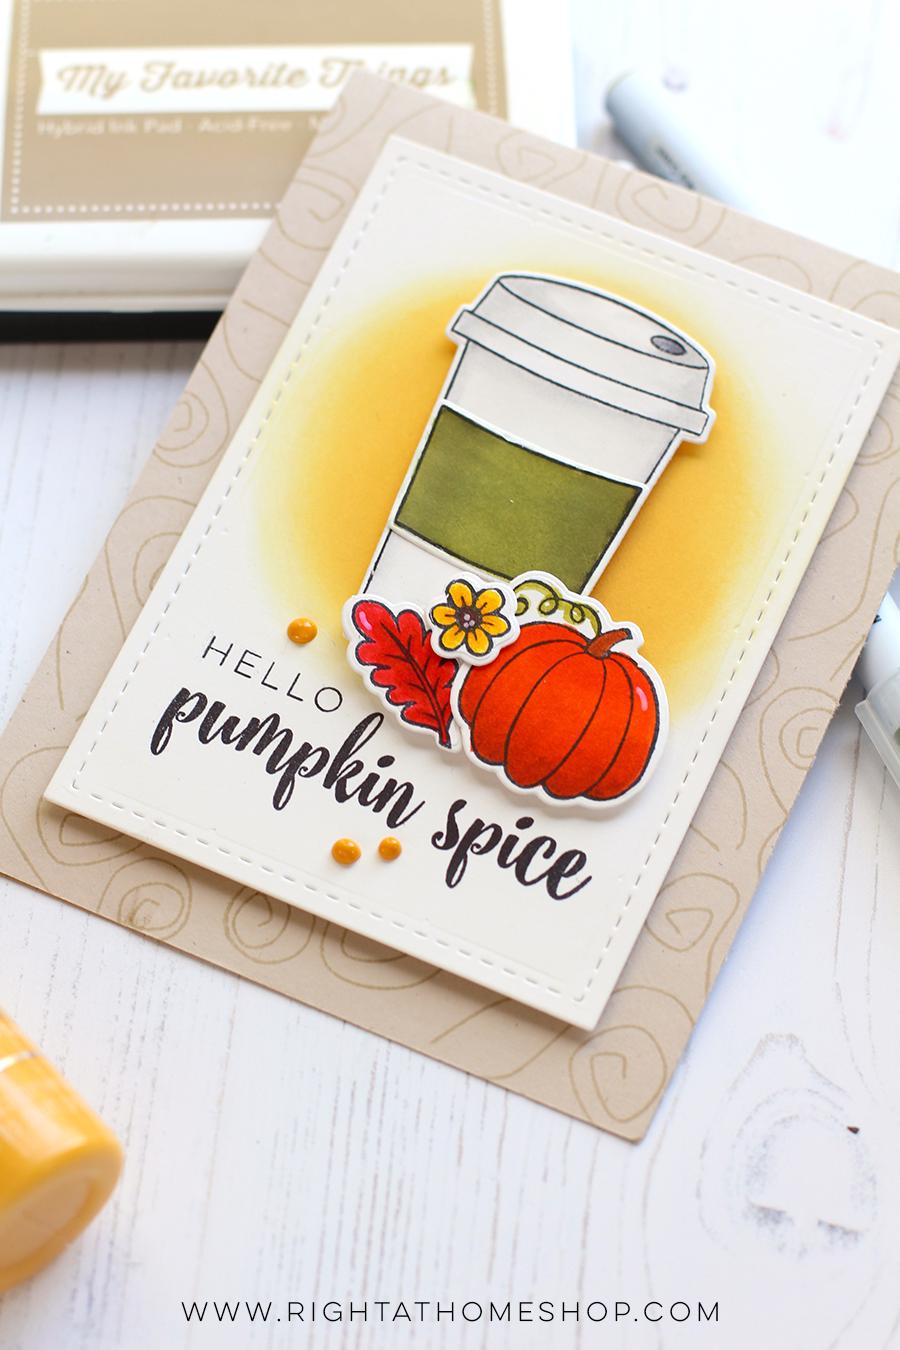 Hello Pumpkin Spice Card // Fall Coffee Lovers Blog Hop Fall 2017 - rightathomeshop.com/blog